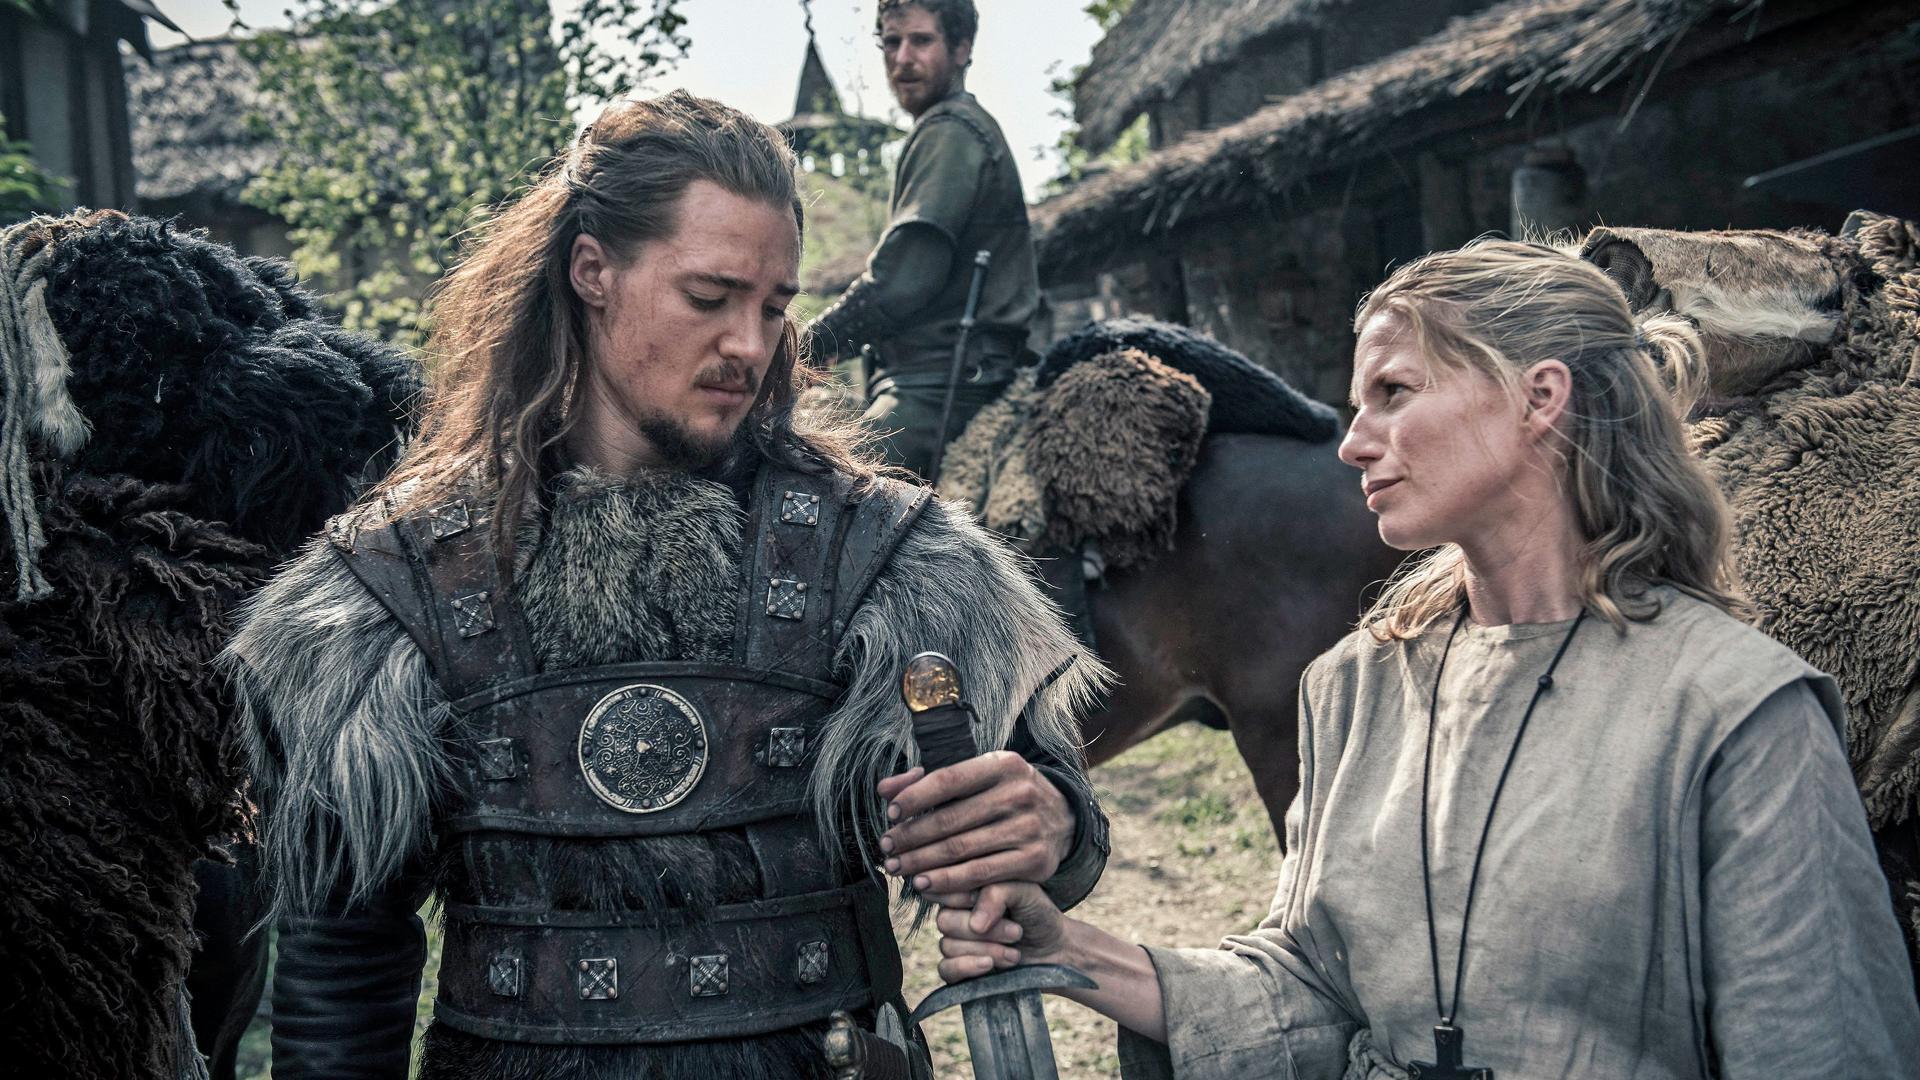 The Last Kingdom (S02E07): Season 2, Episode 7 Summary